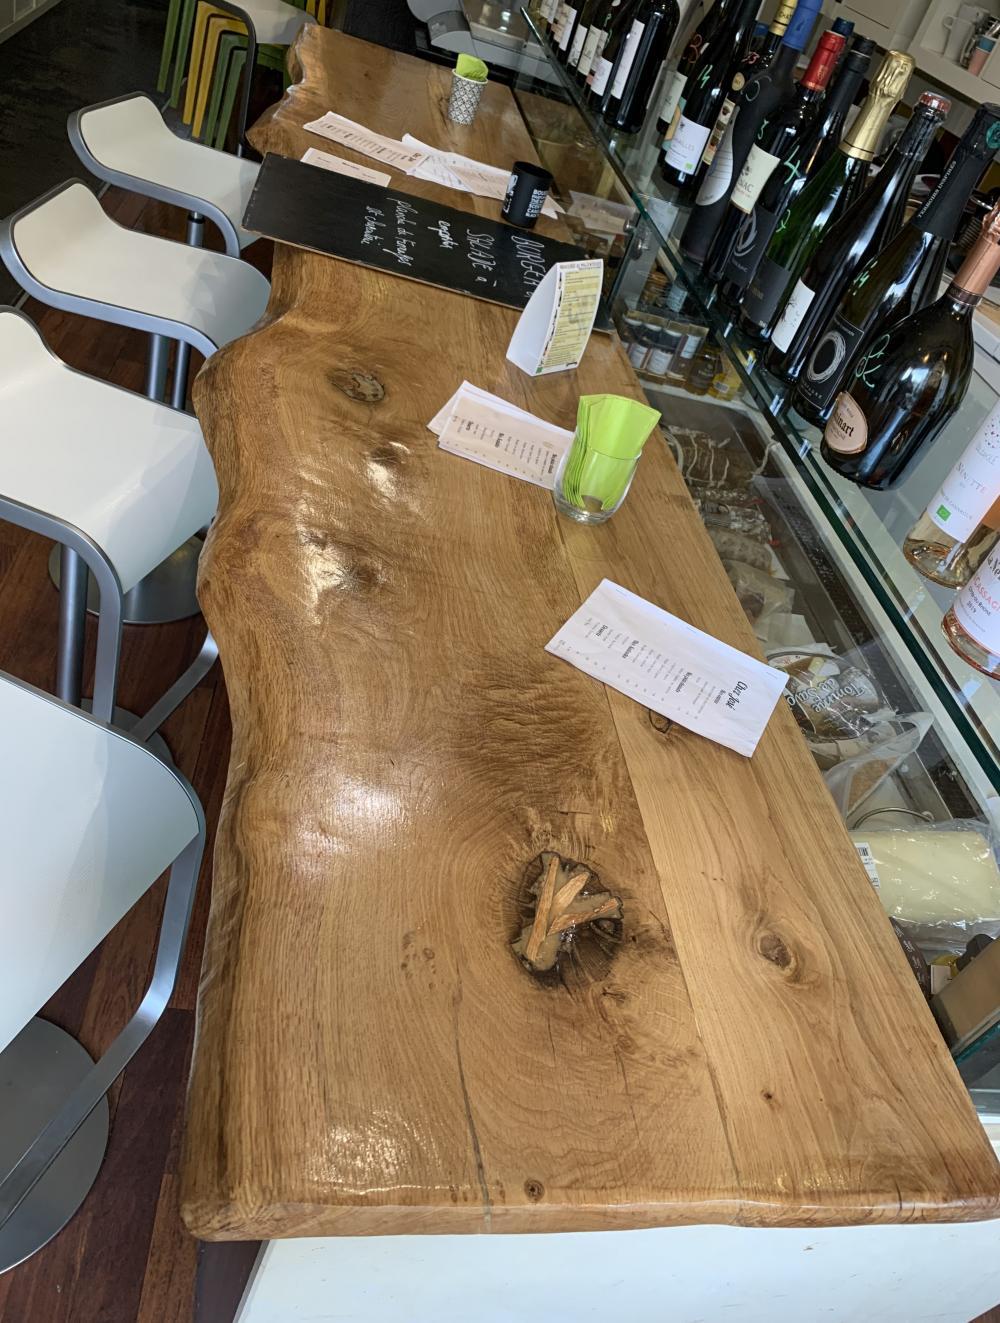 Comptoir en chêne bords irréguliers avec vernis marin – 1200.00€